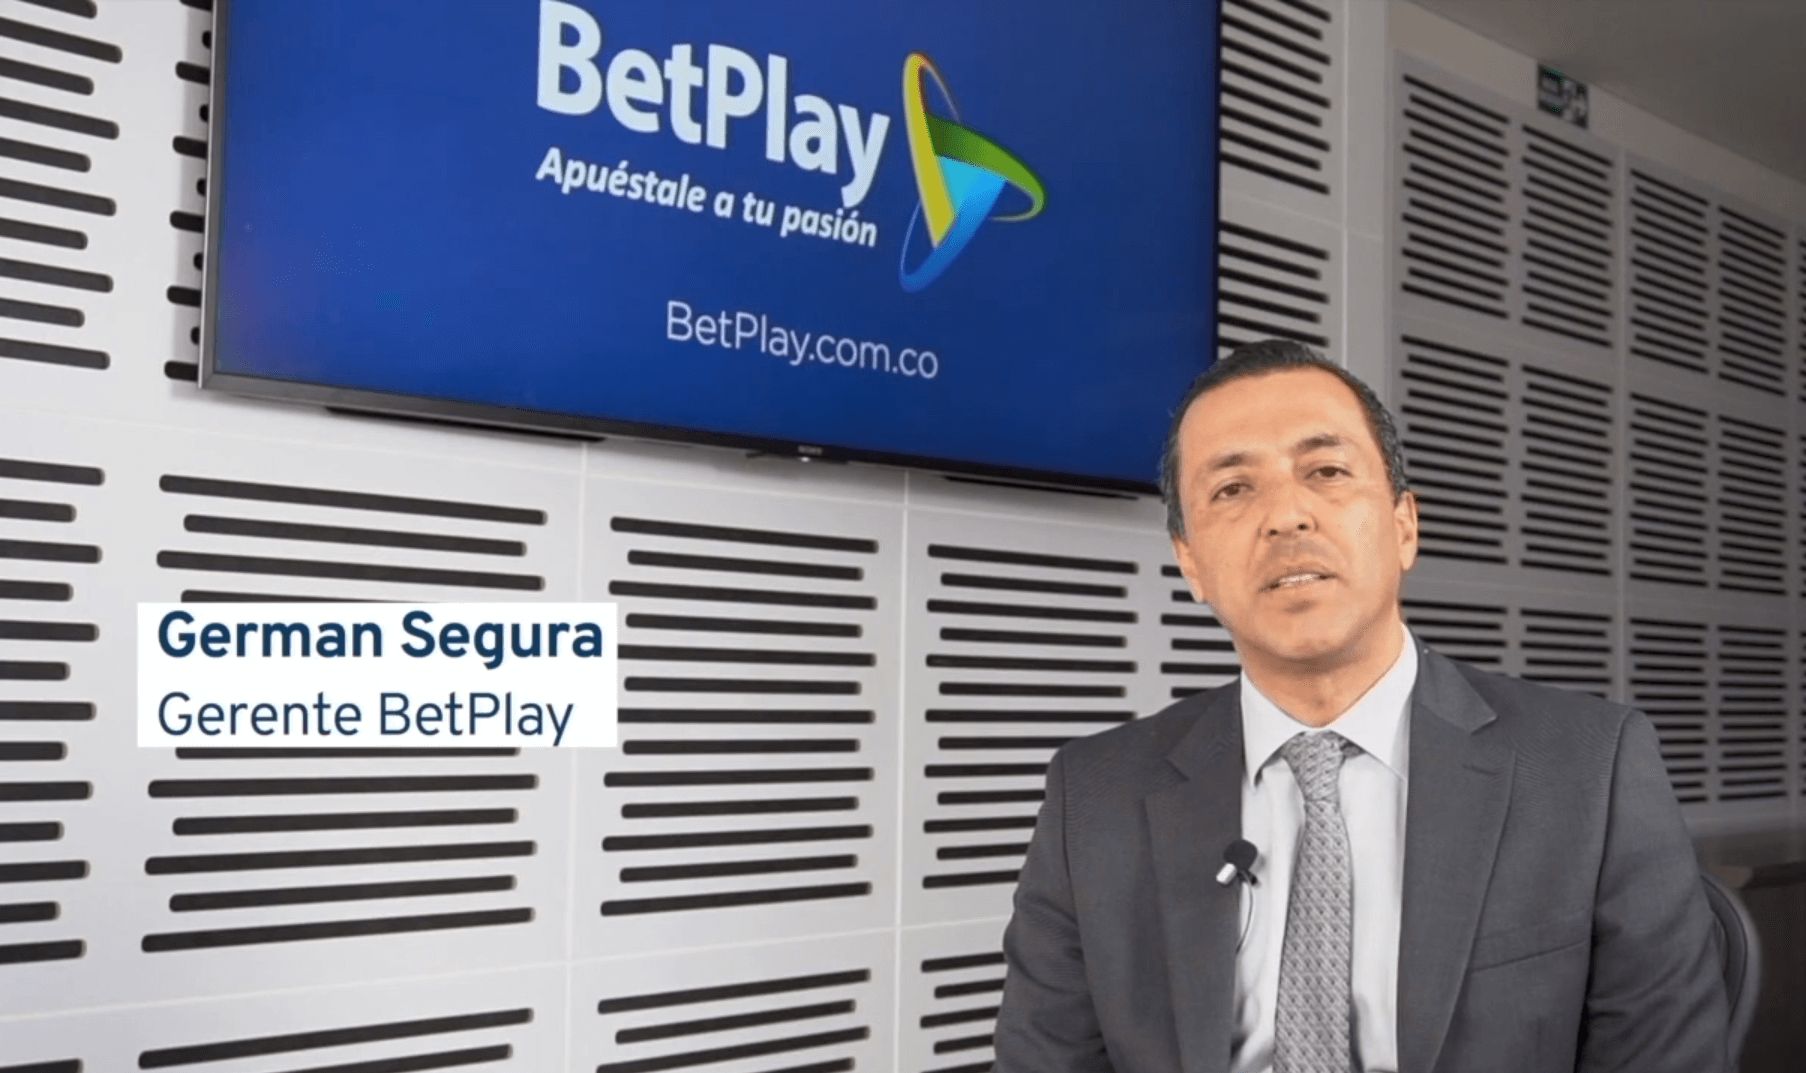 Betplay CEO